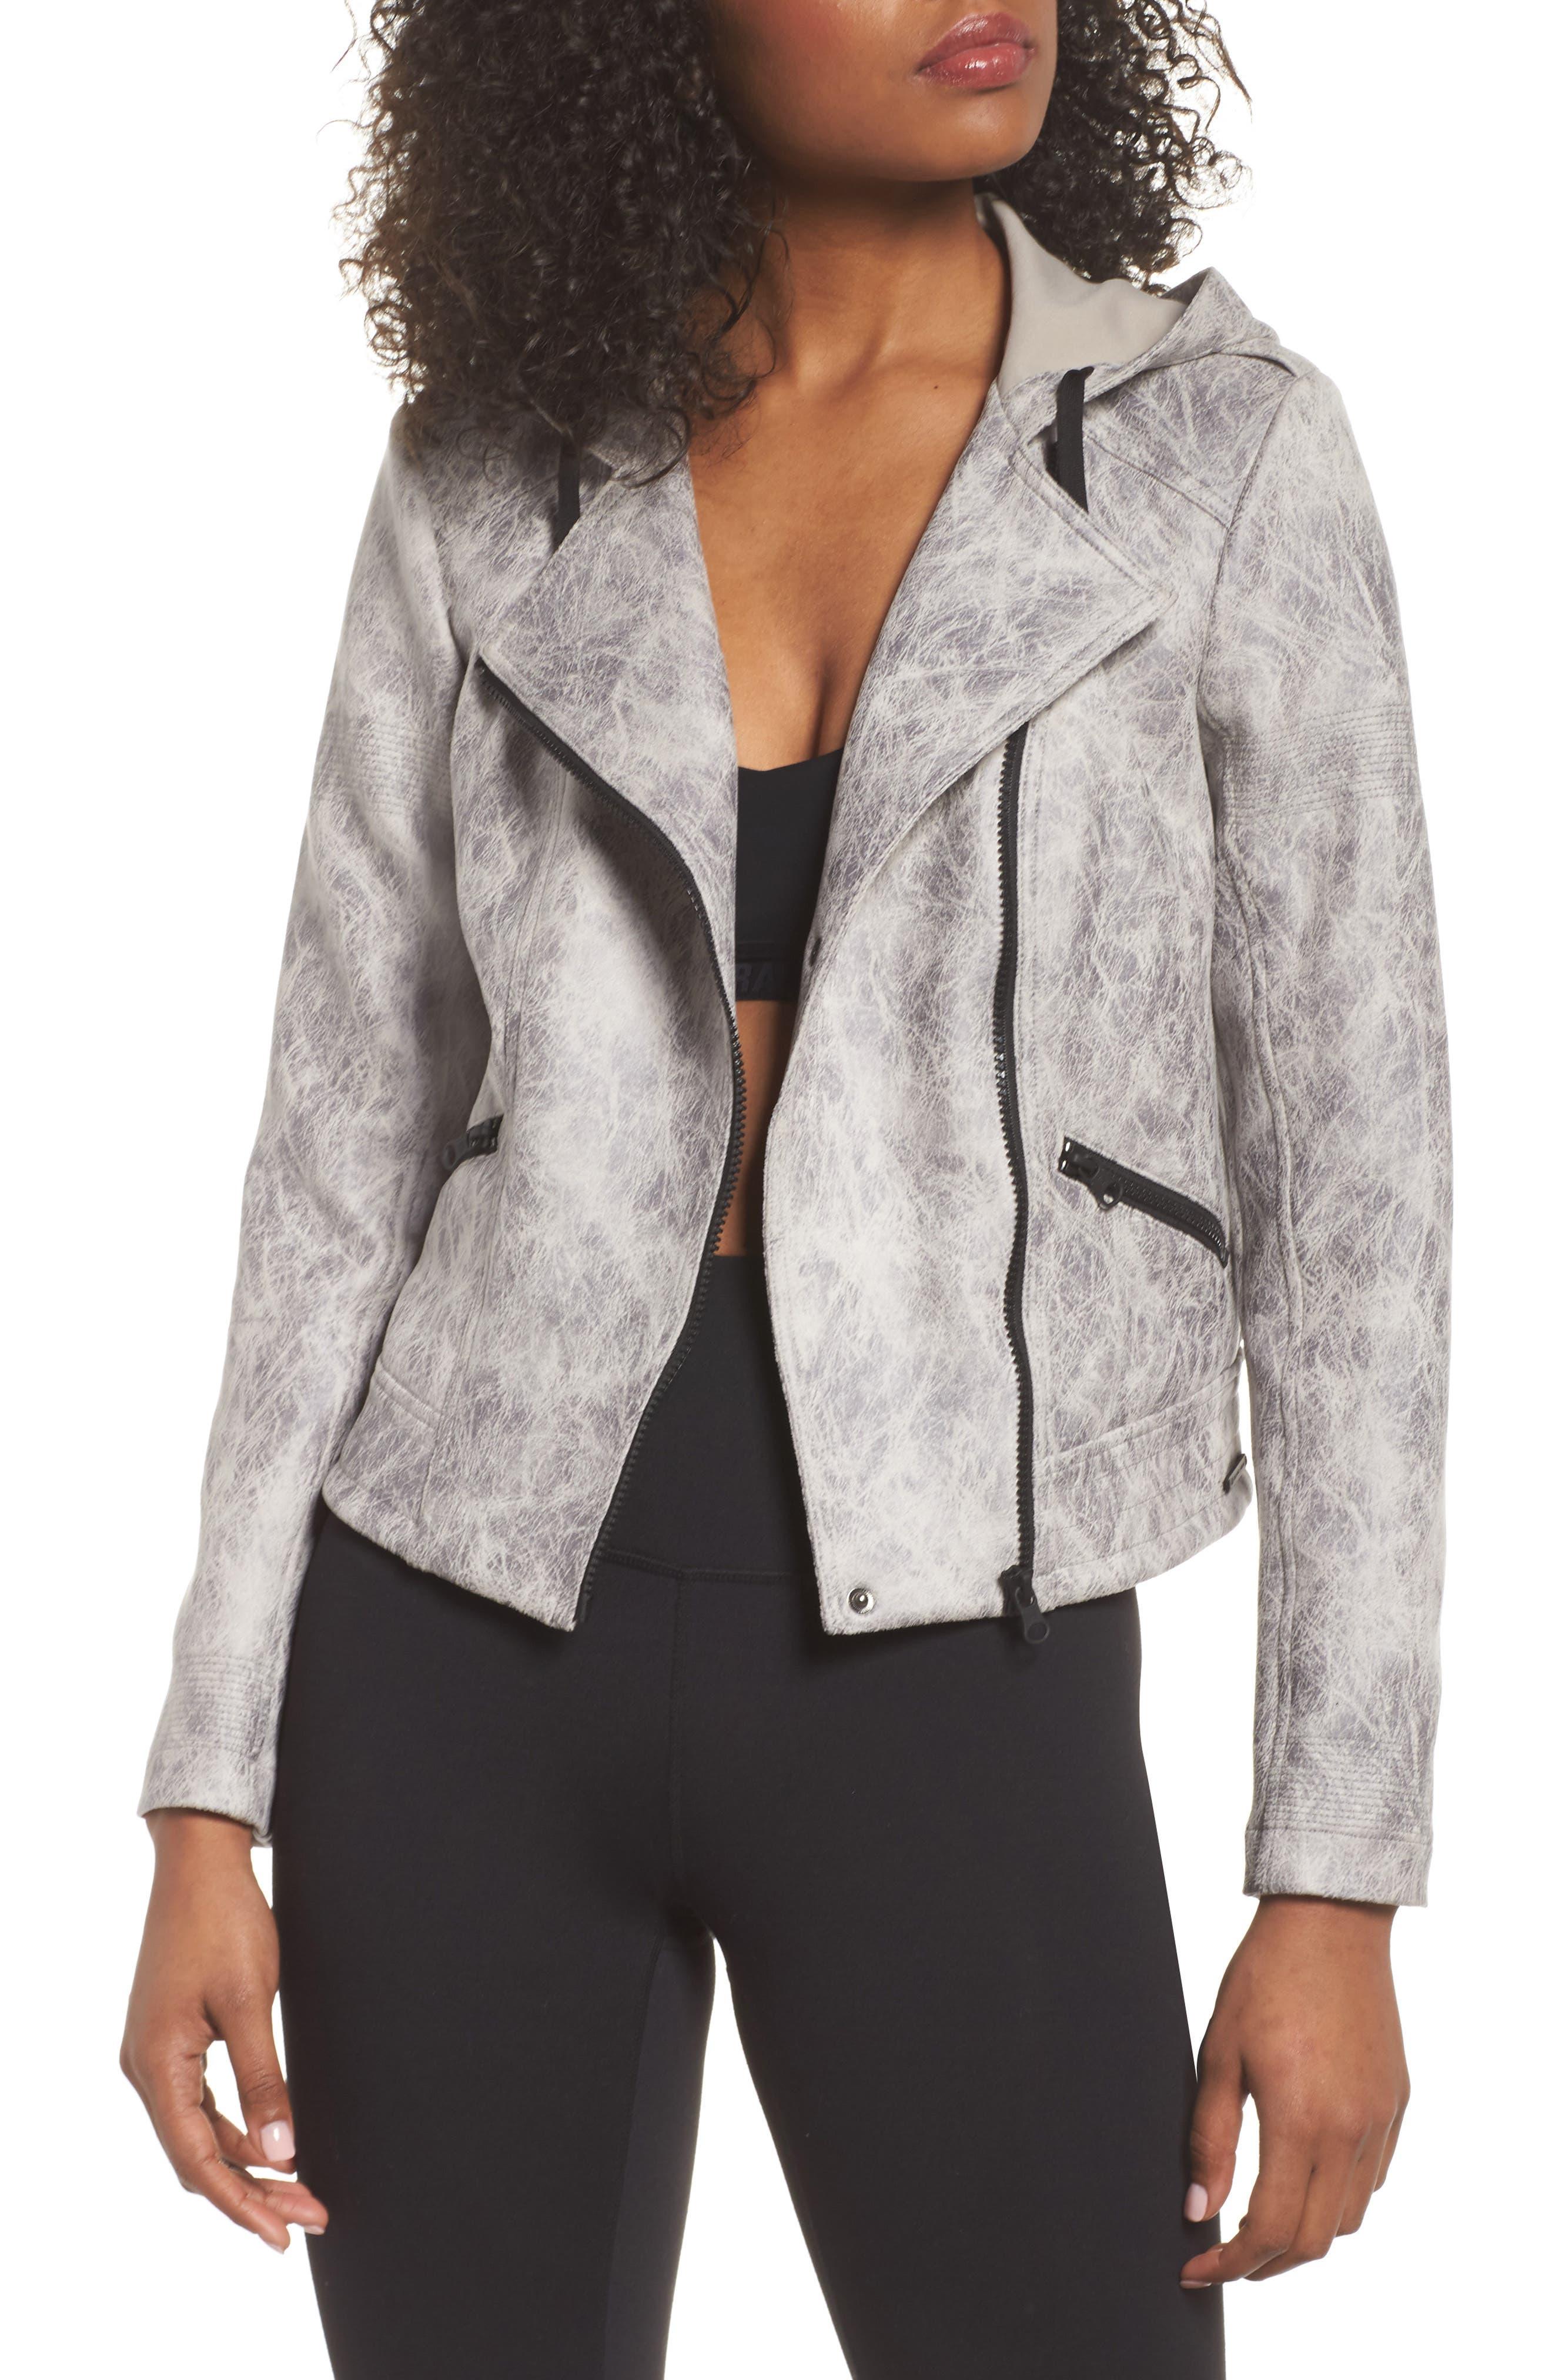 Blanc Noir Hooded Faux Leather Moto Jacket